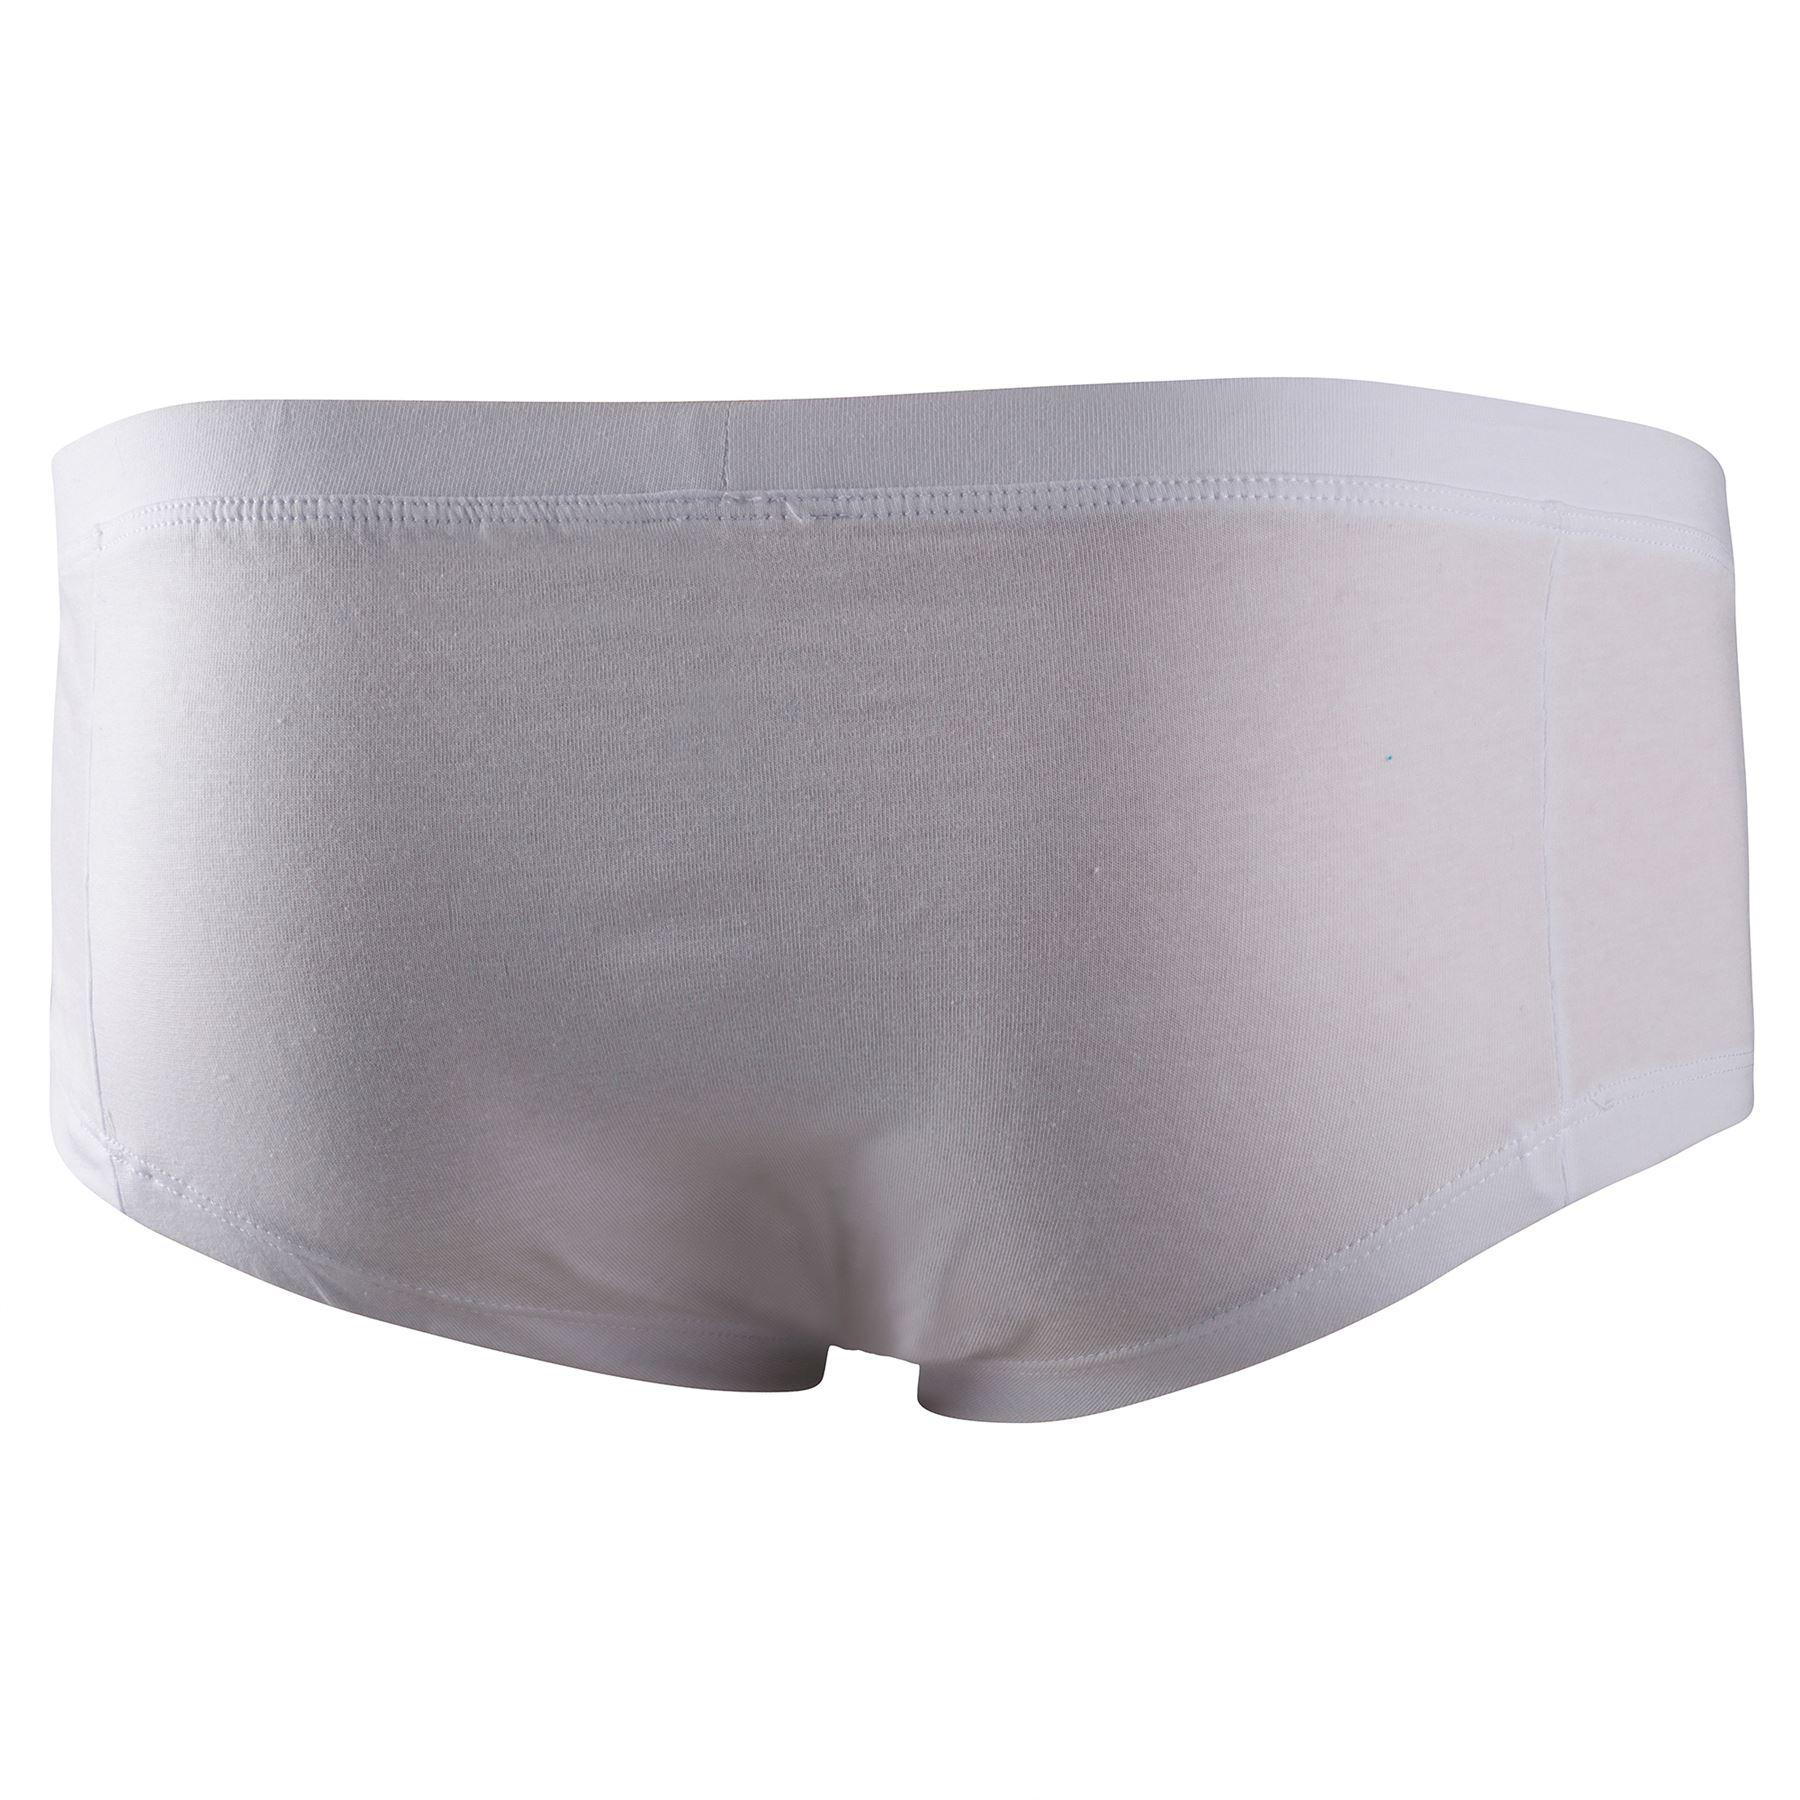 Doreanse-1750-Adonis-Anatomical-Trunk-Supportive-Enhancing-Men-039-s-underwear miniatuur 9